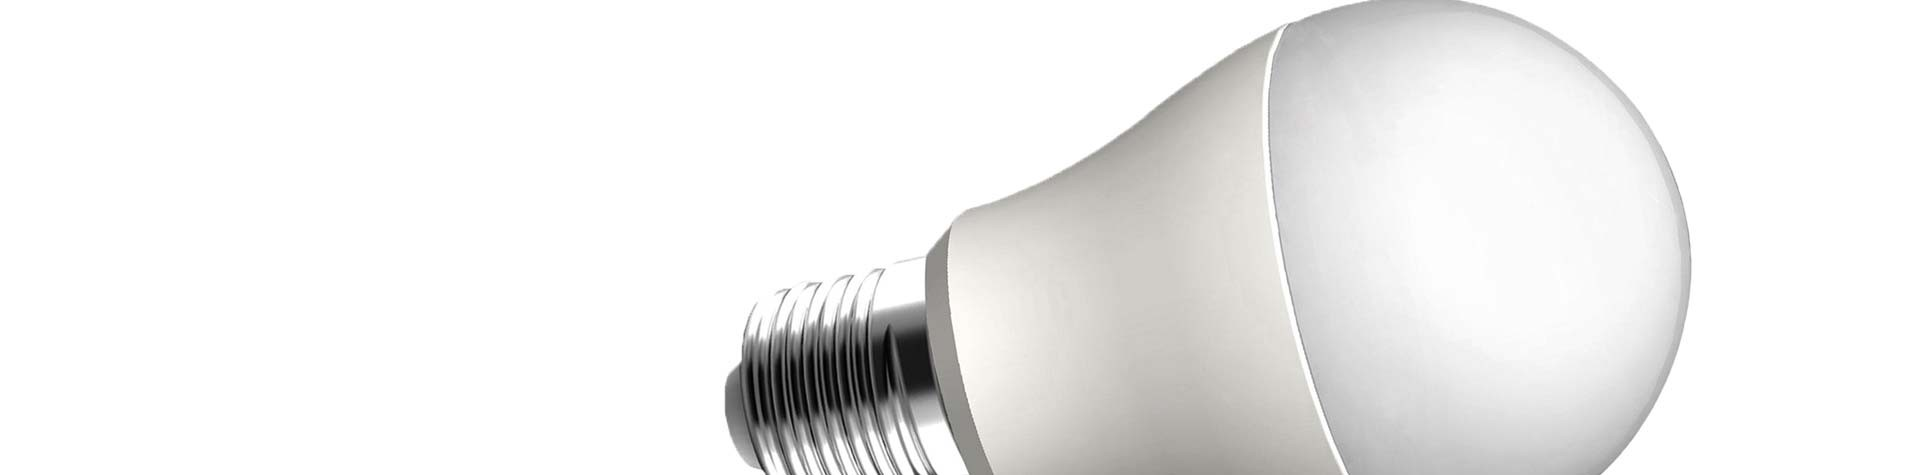 http://www.led-store.it/illuminotecnica/lampadine-a-led/attacco-e27.html?lev=2